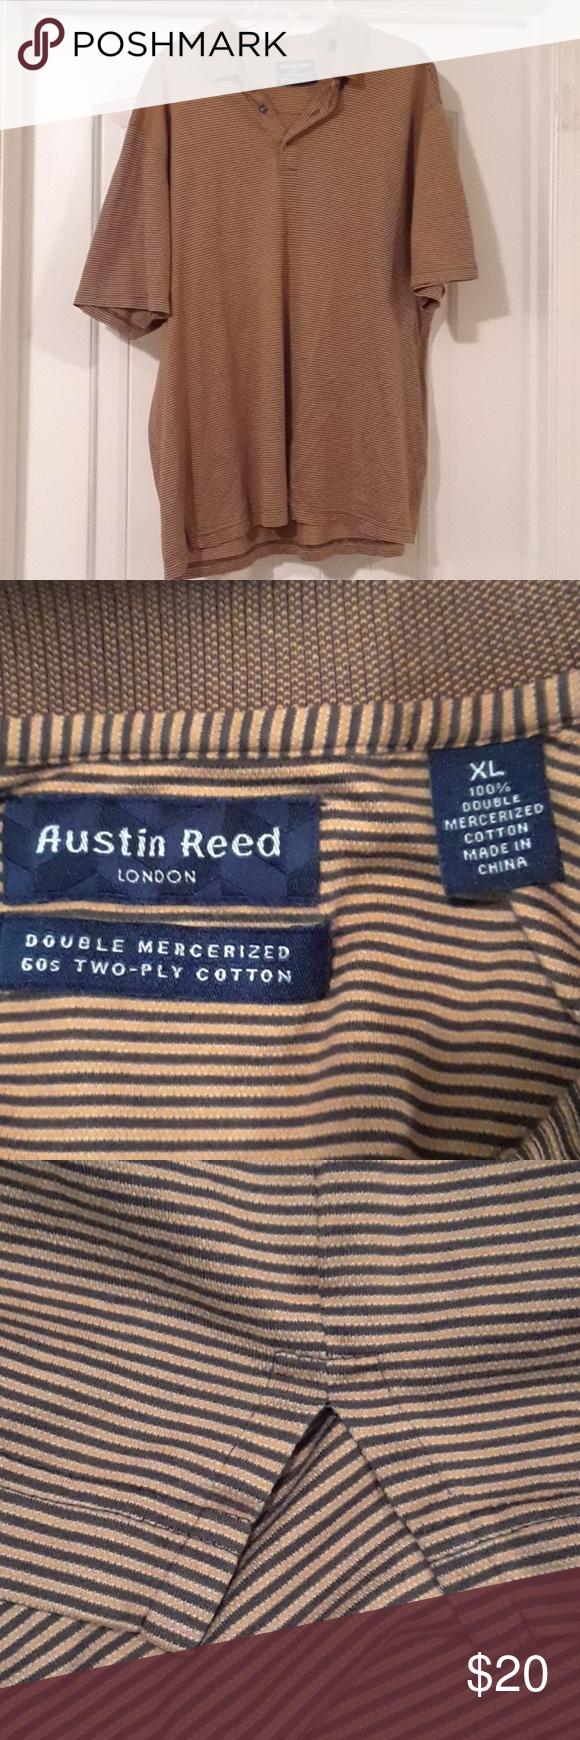 Austin Reed Short Sleeve Shirt Austin Reed London Short Sleeve Shirt 100 Double Mercerized Cotton Inv 72711 Austin Ree Austin Reed Short Sleeve Shirt Sleeves